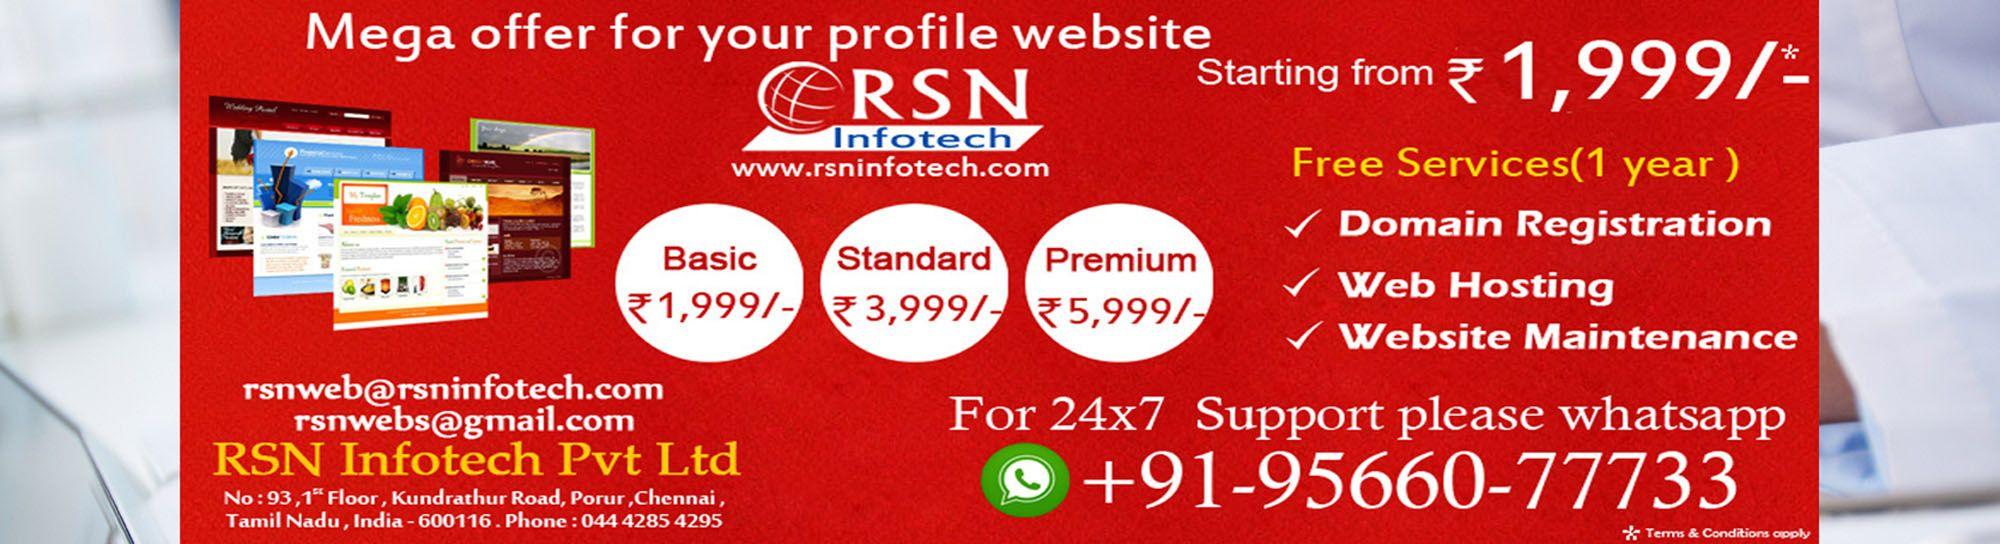 Software Development Support Digital Marketing Web Designing Web Development Seo In Chenna Custom Web Design Web Design Company Web Hosting Website